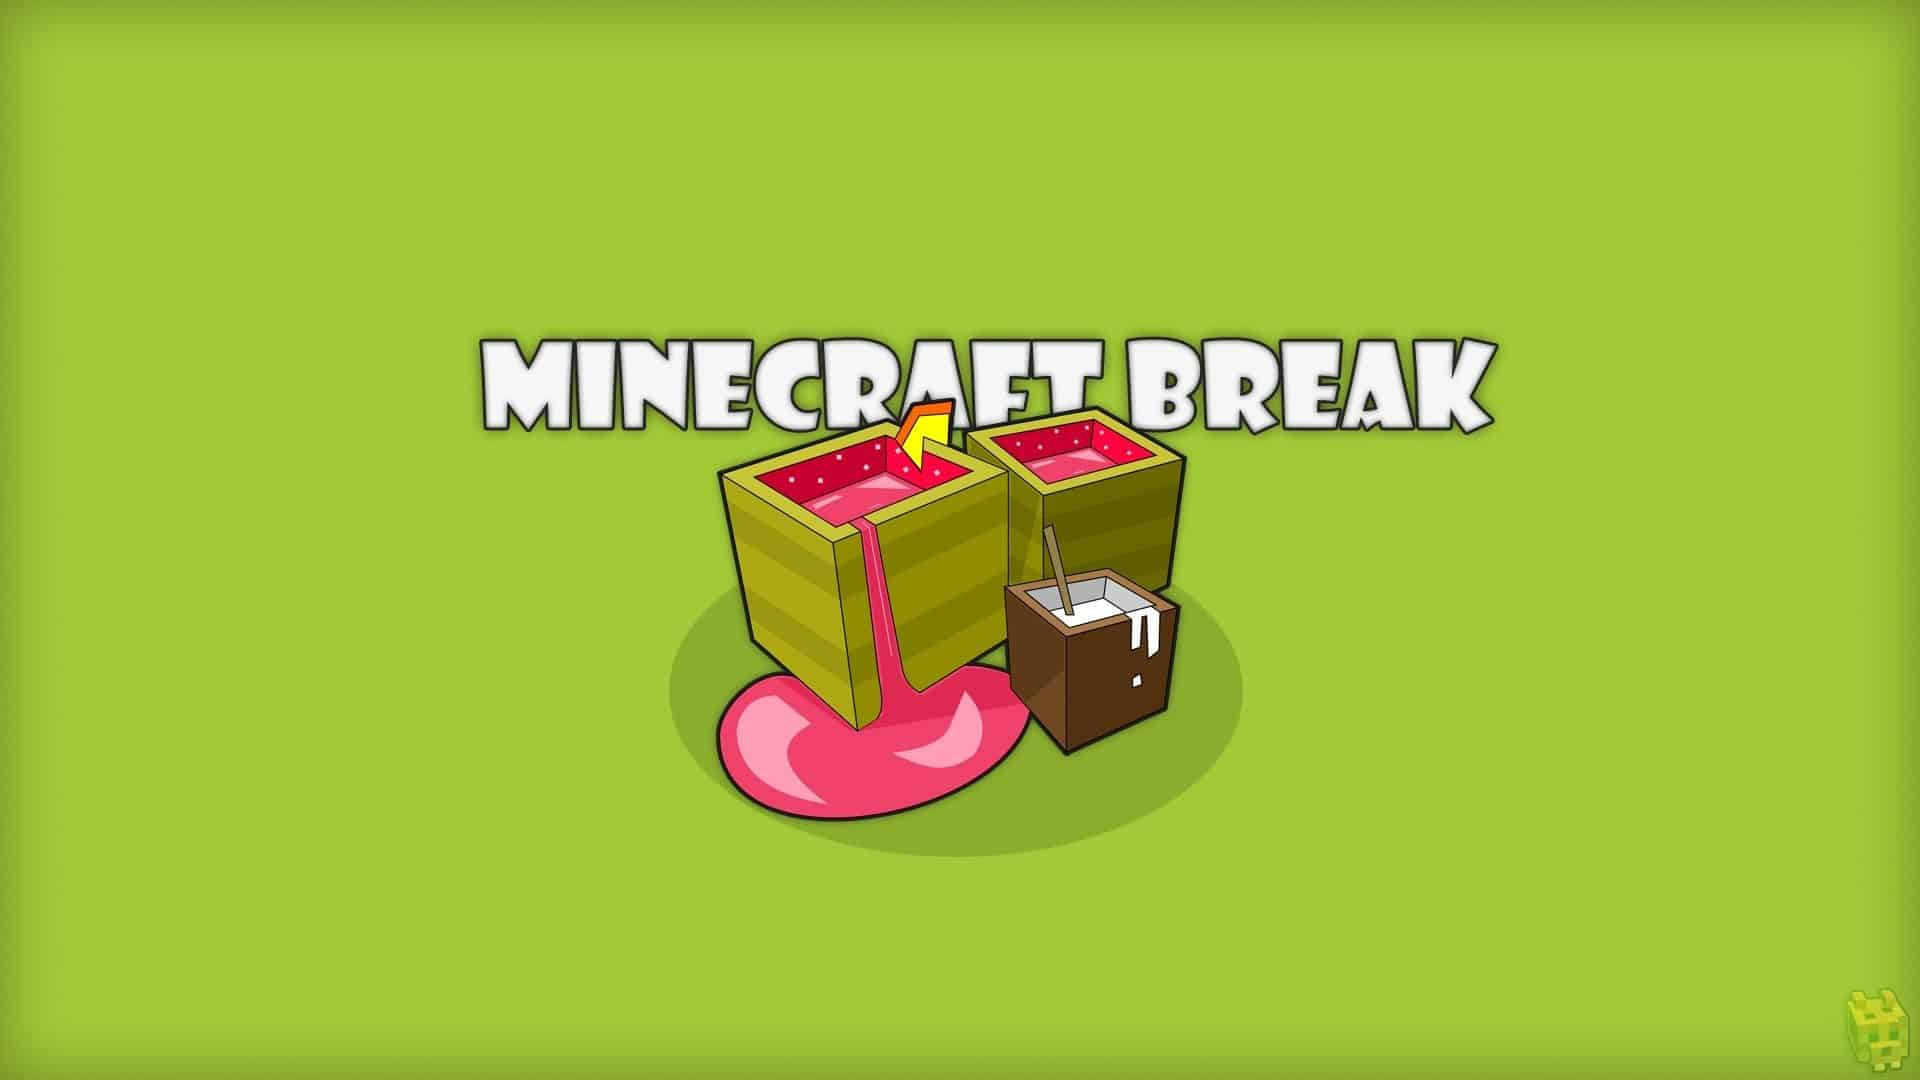 minecraft_break___wallpaper_by_dentvanboo-d5mwhjn